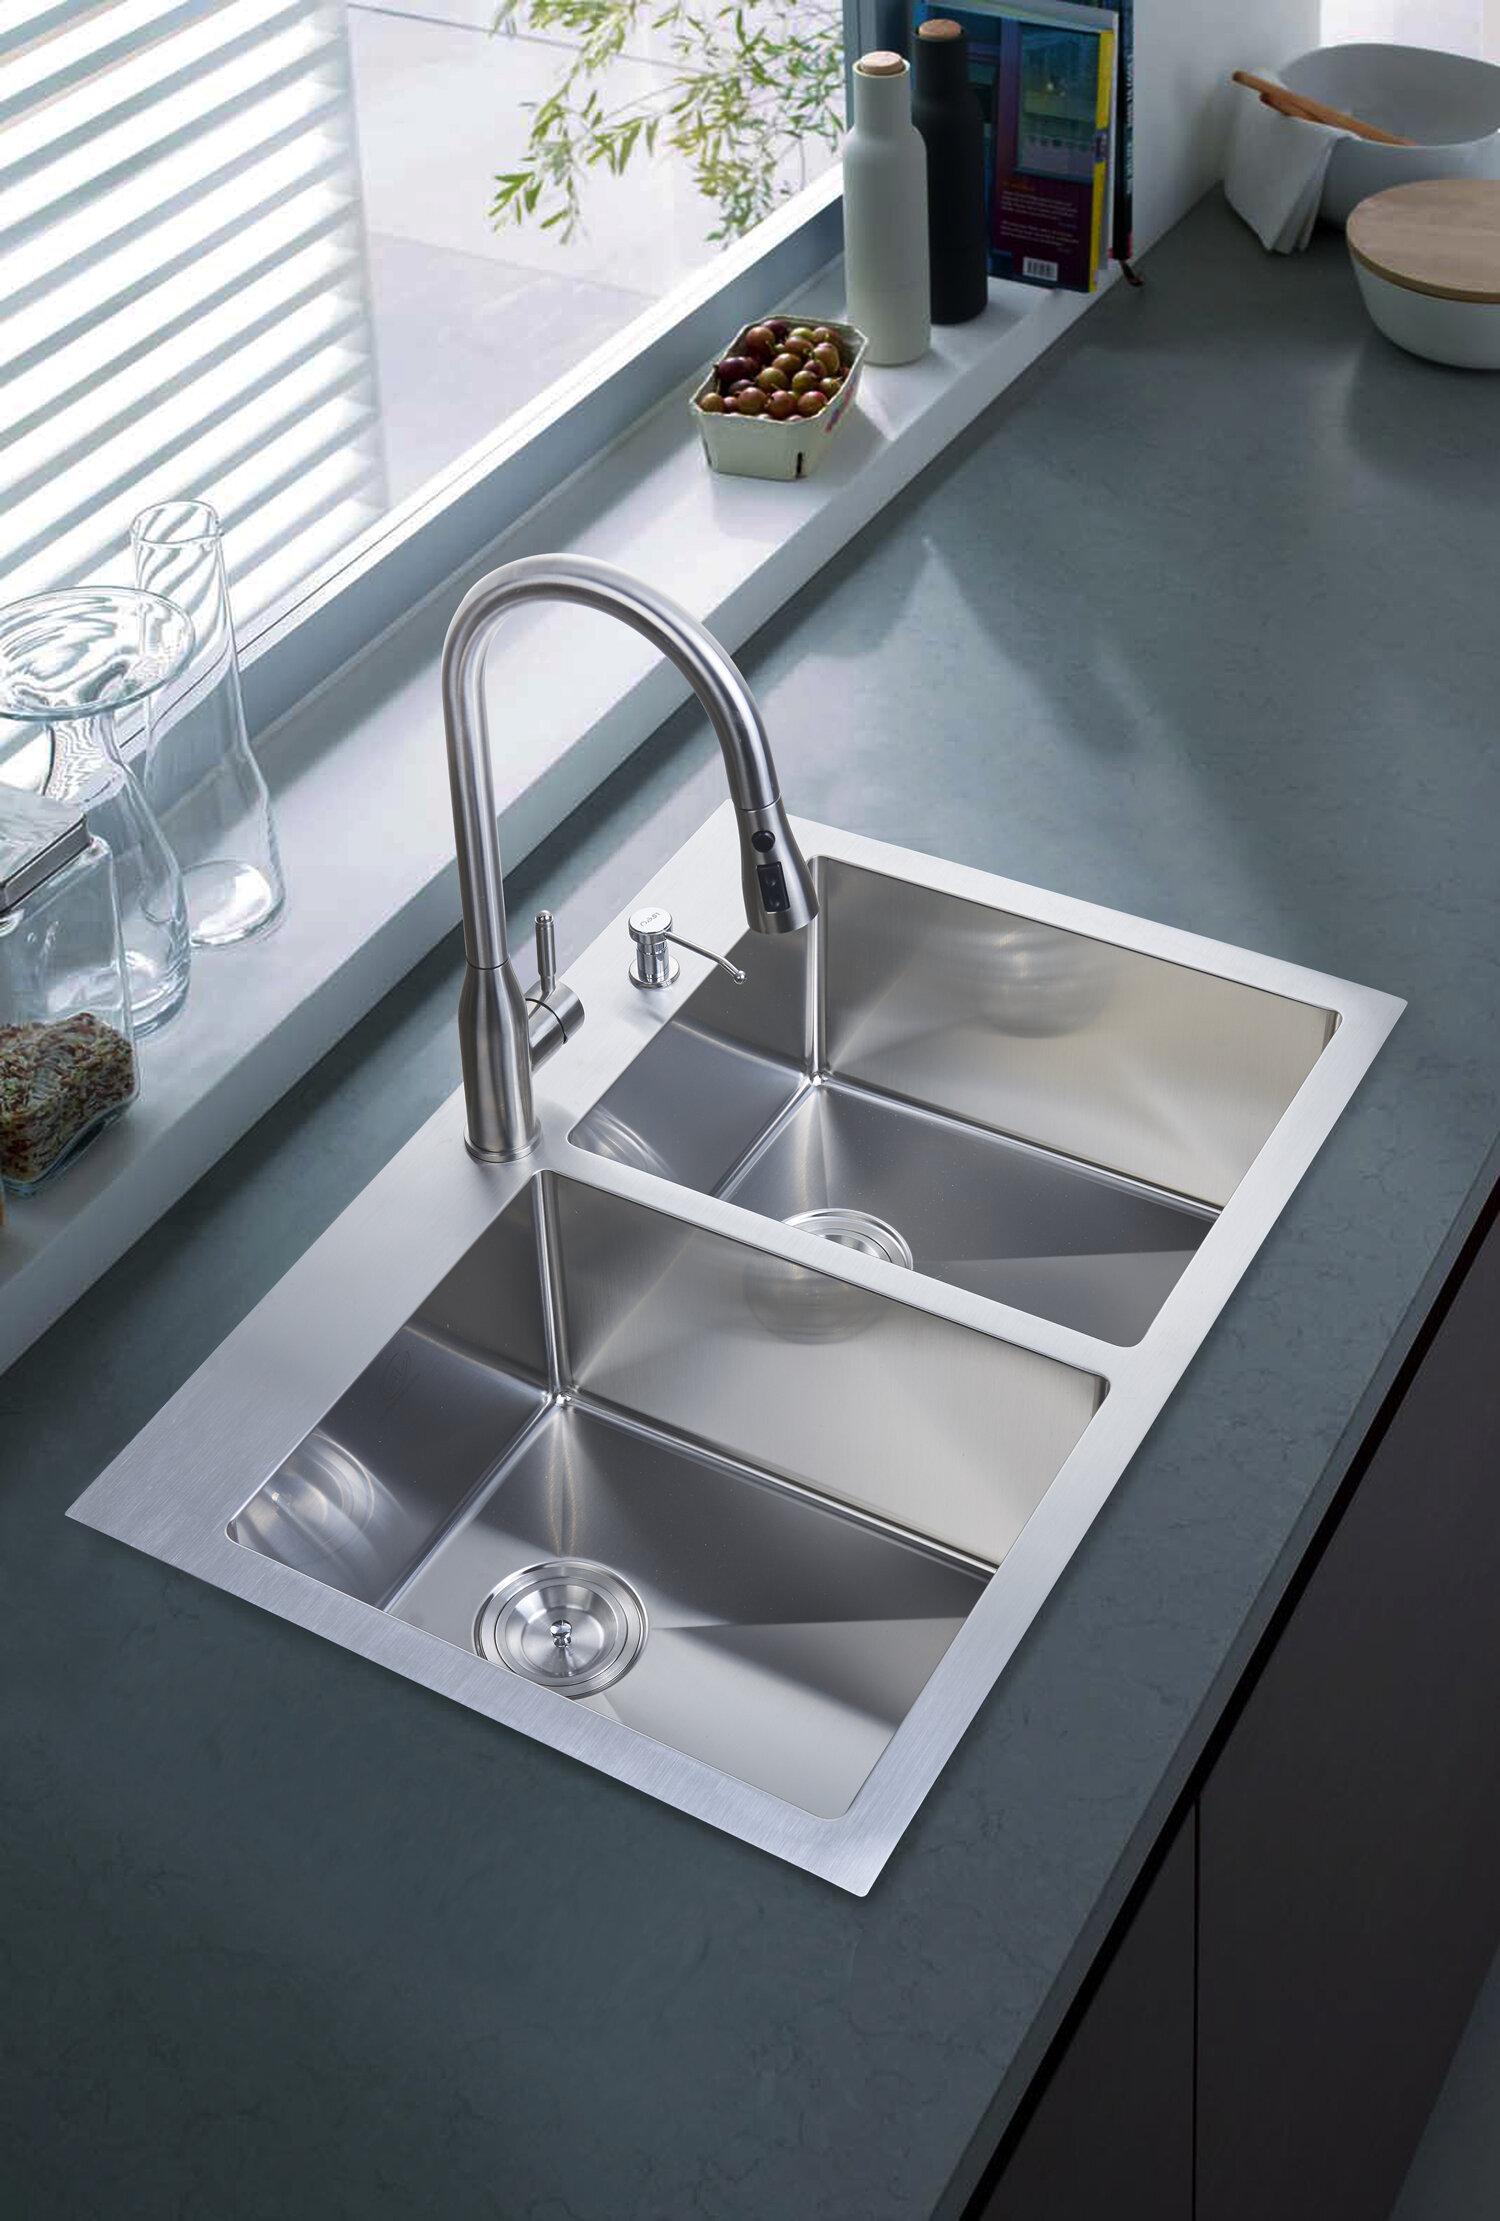 dcor design 33 x 22 overmount kitchen sink reviews wayfair rh wayfair com kitchen sinks overmount vs. undermount